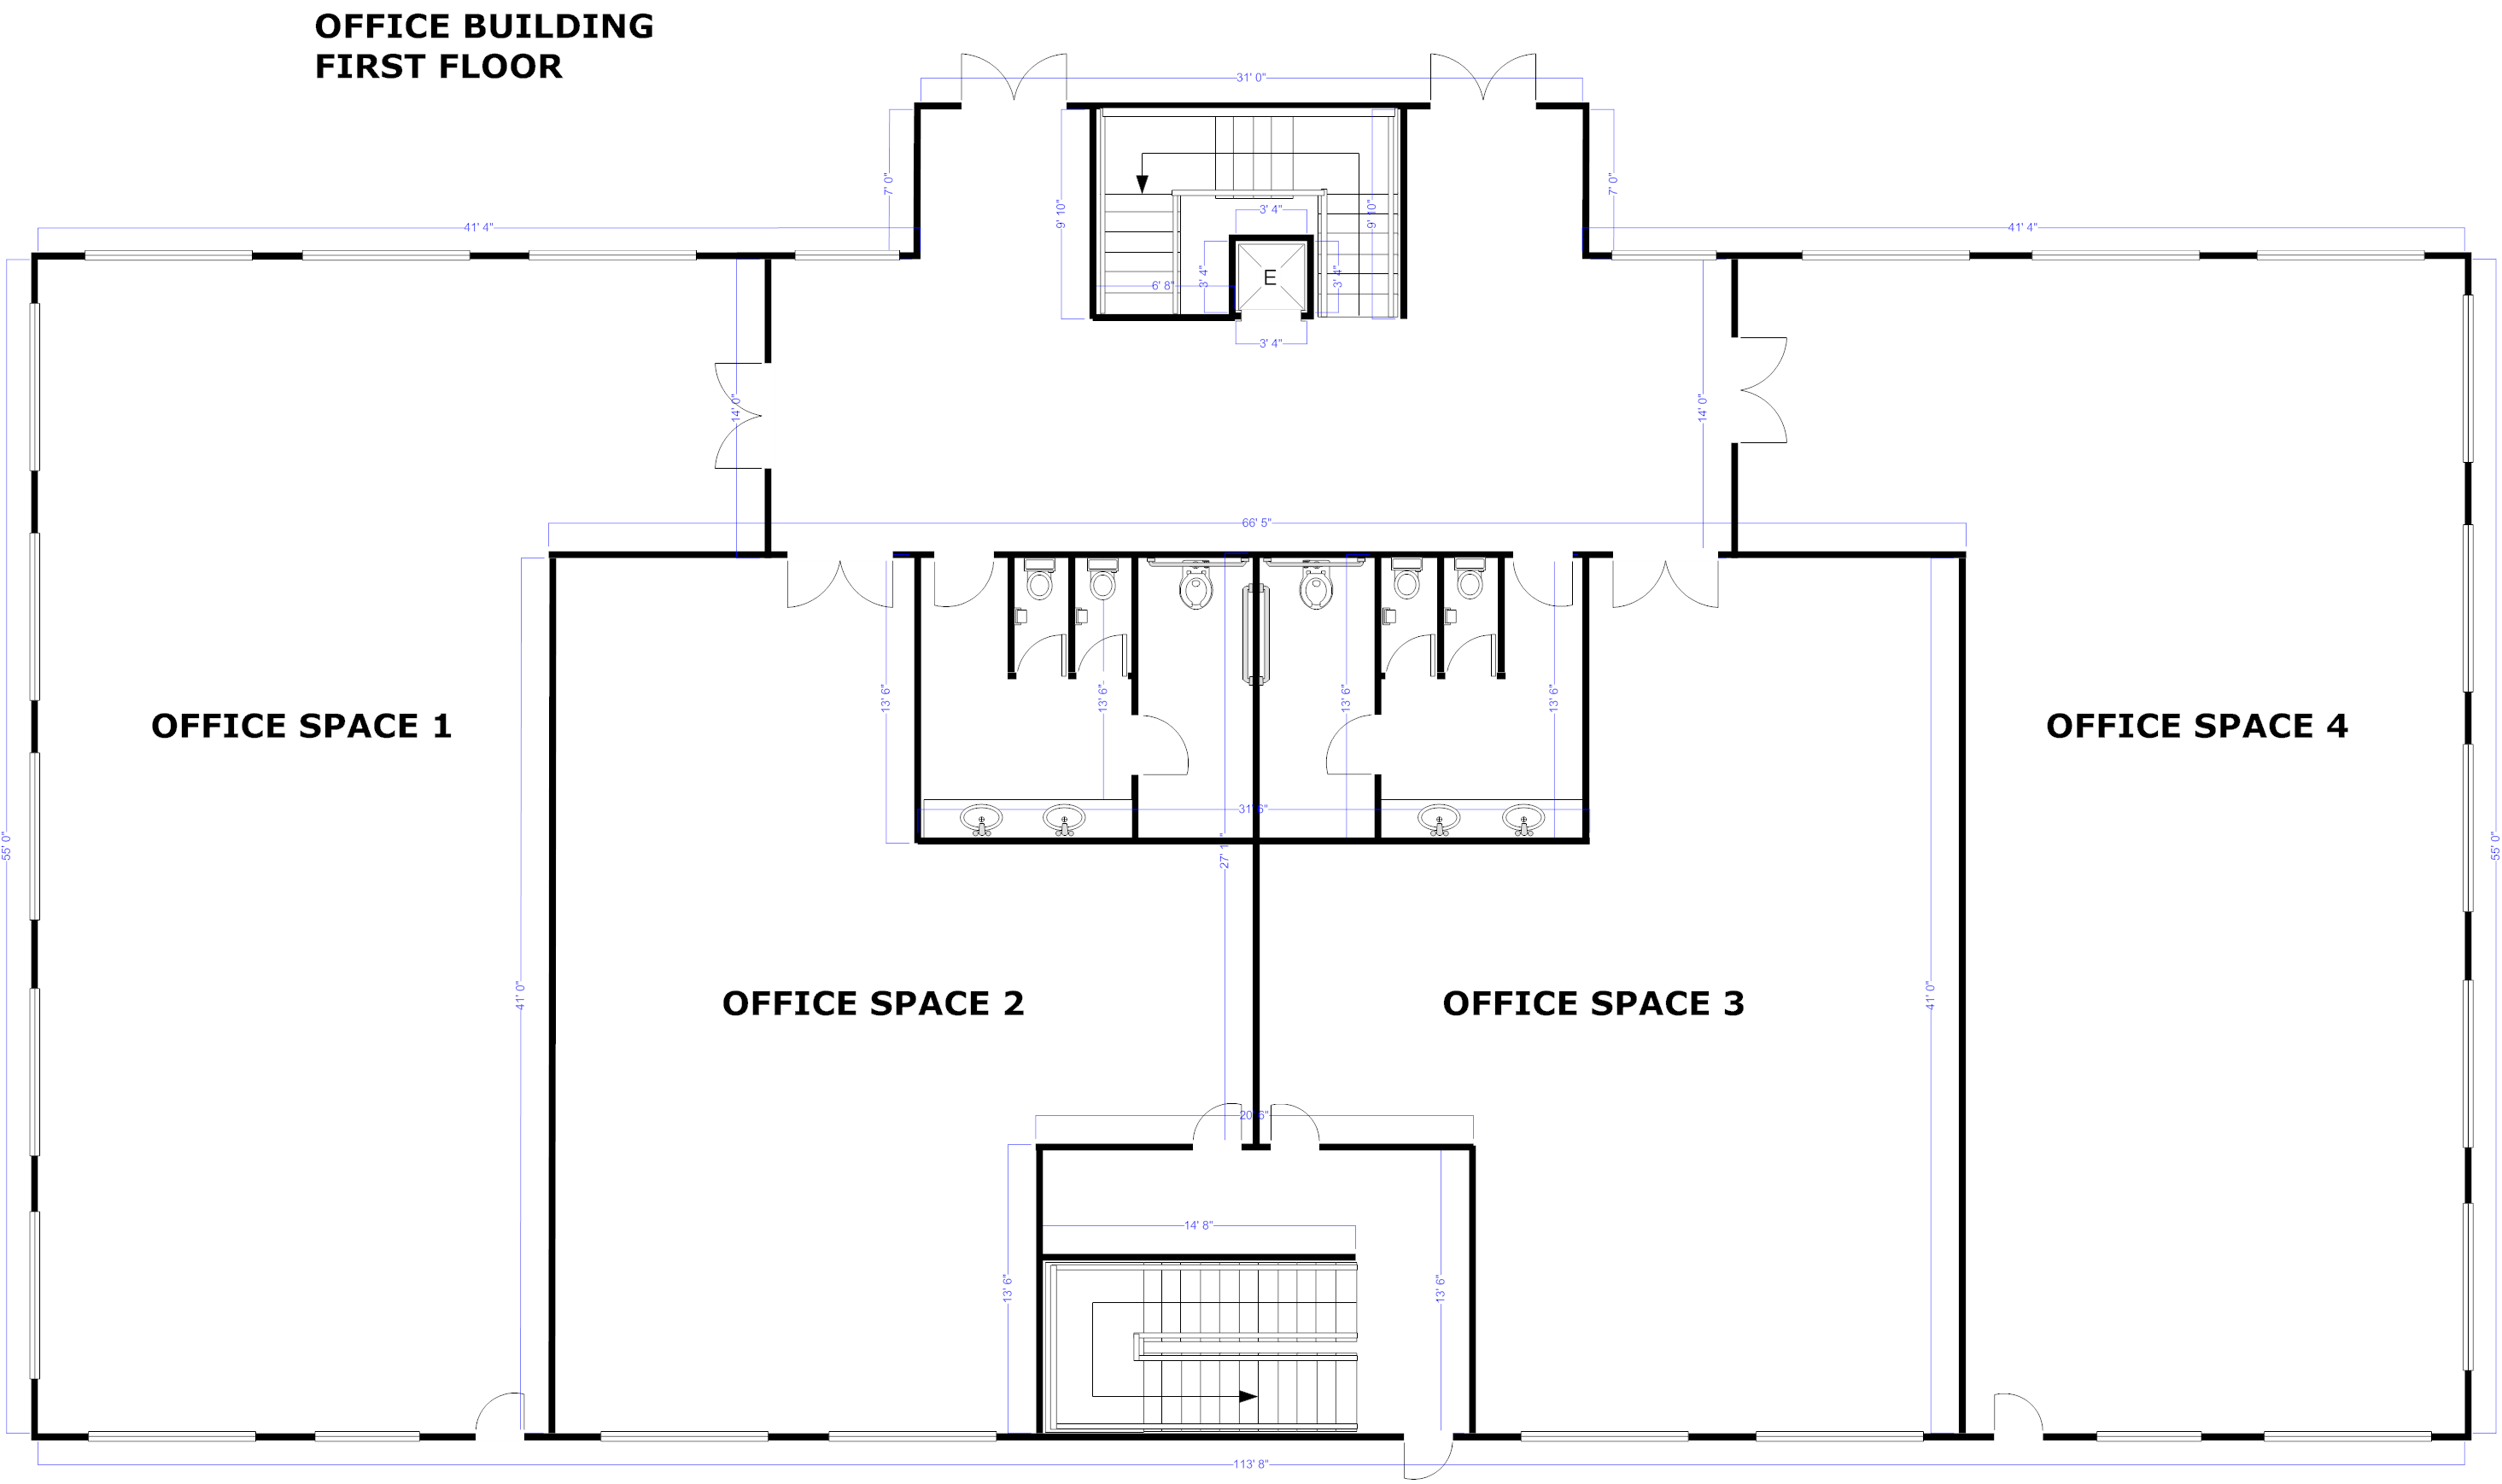 Drawn office plan drawing Blueprint Blueprint App Free &